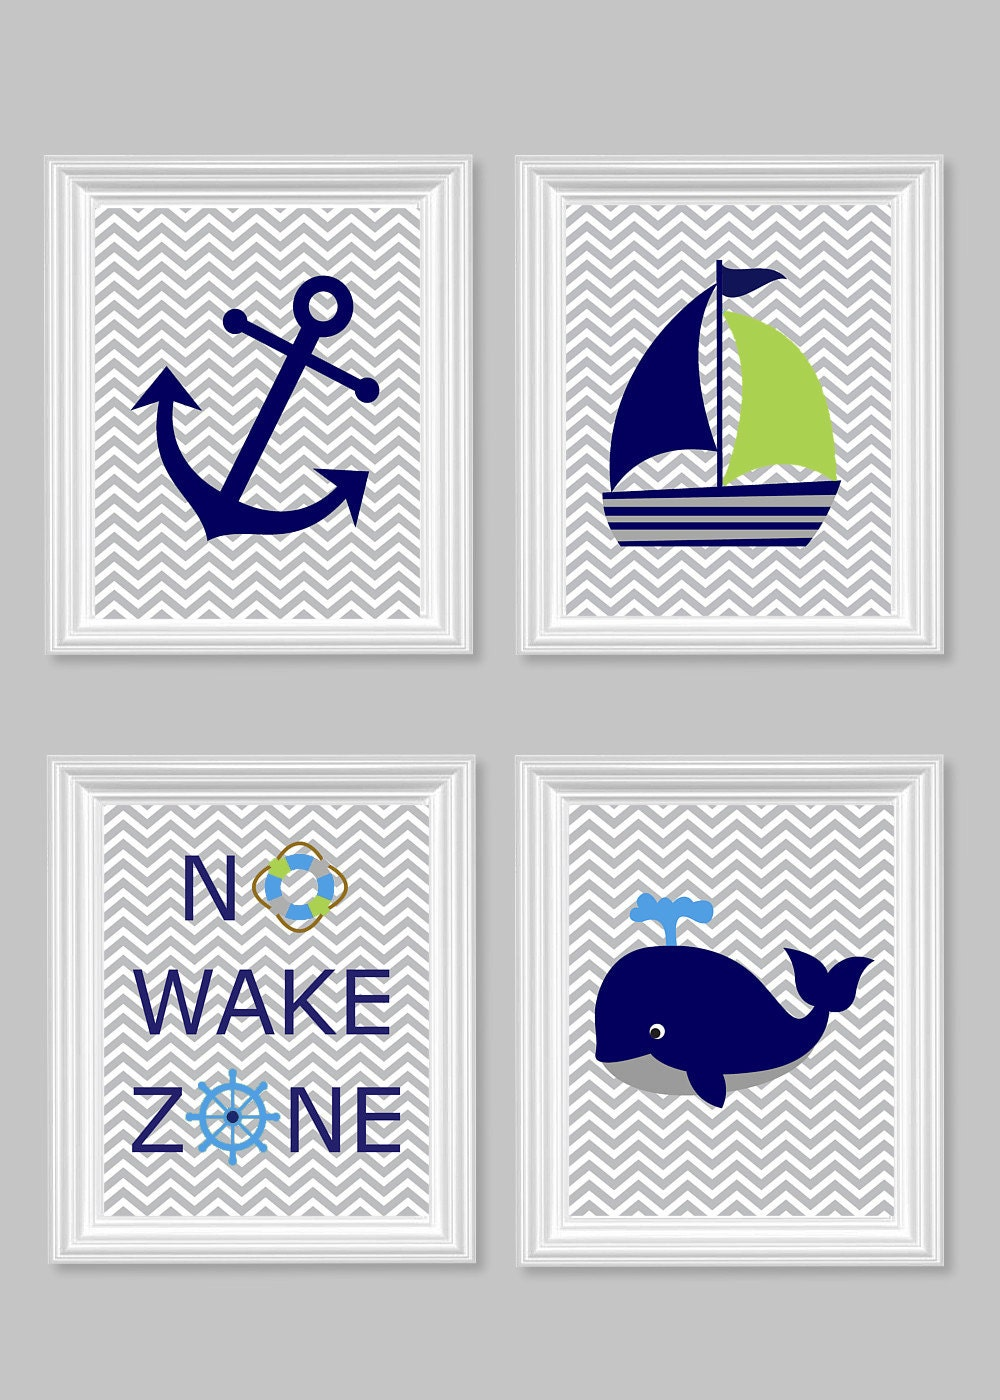 Nautical Nursery Art No Wake Zone Whale Anchor Sailboat